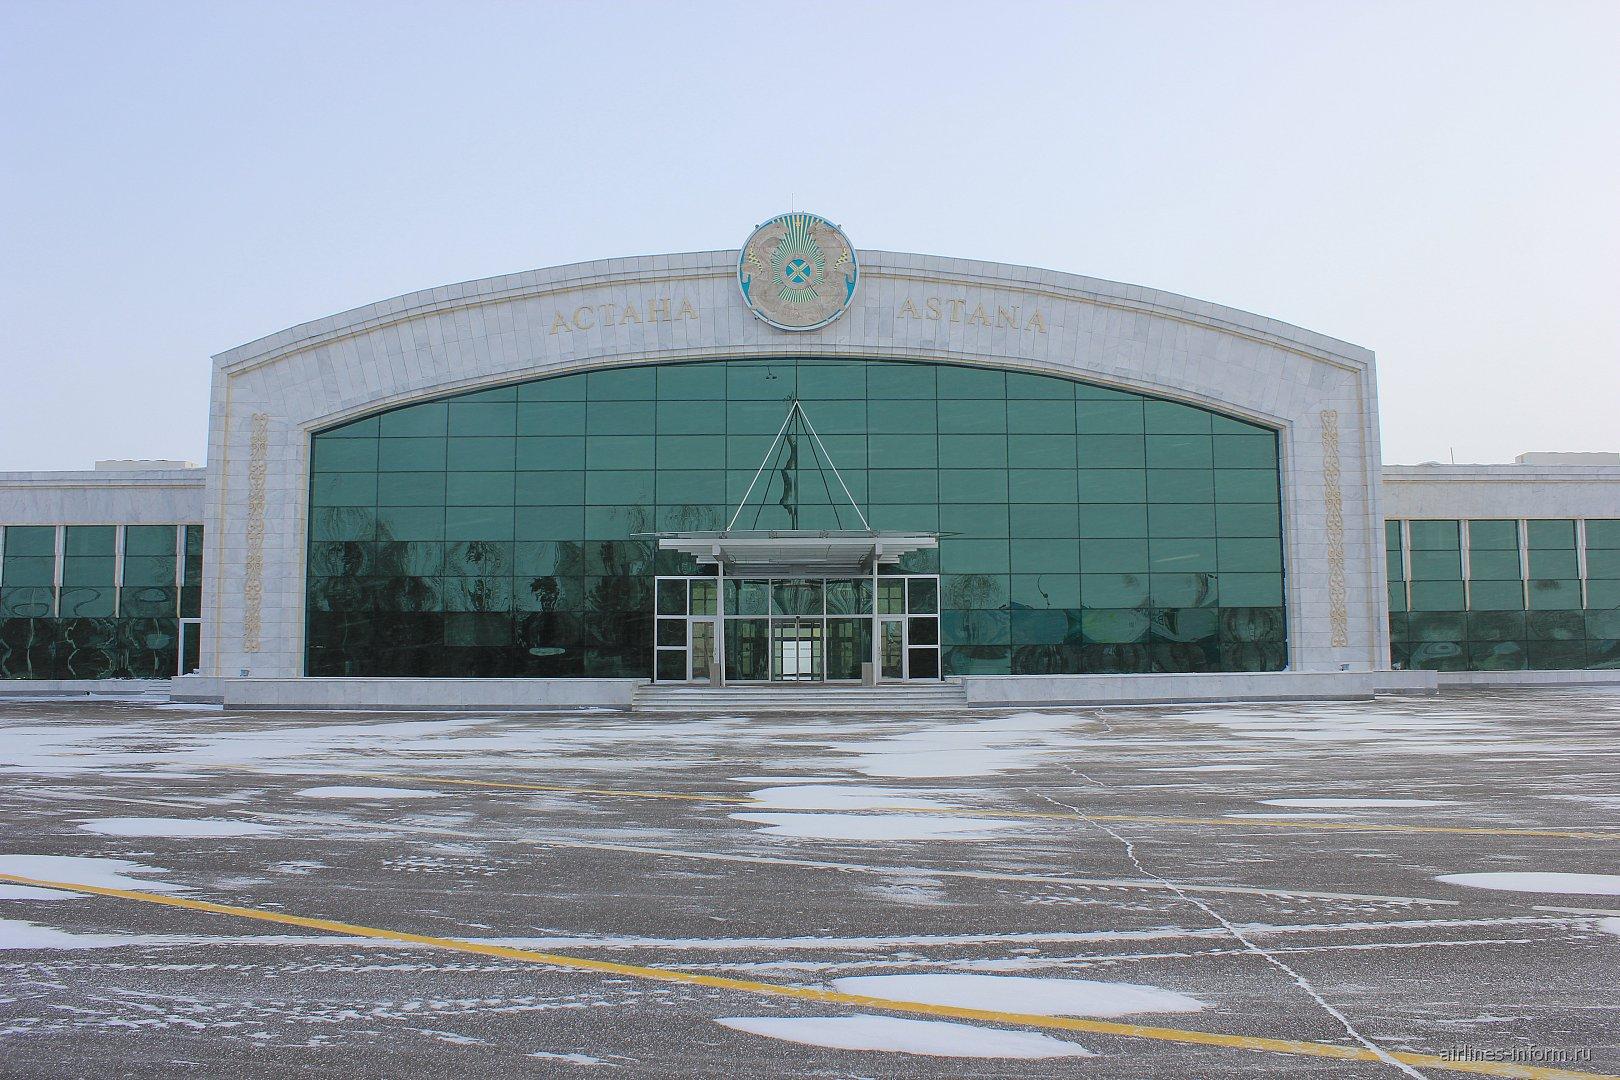 Президентский терминал в аэропорту Астана